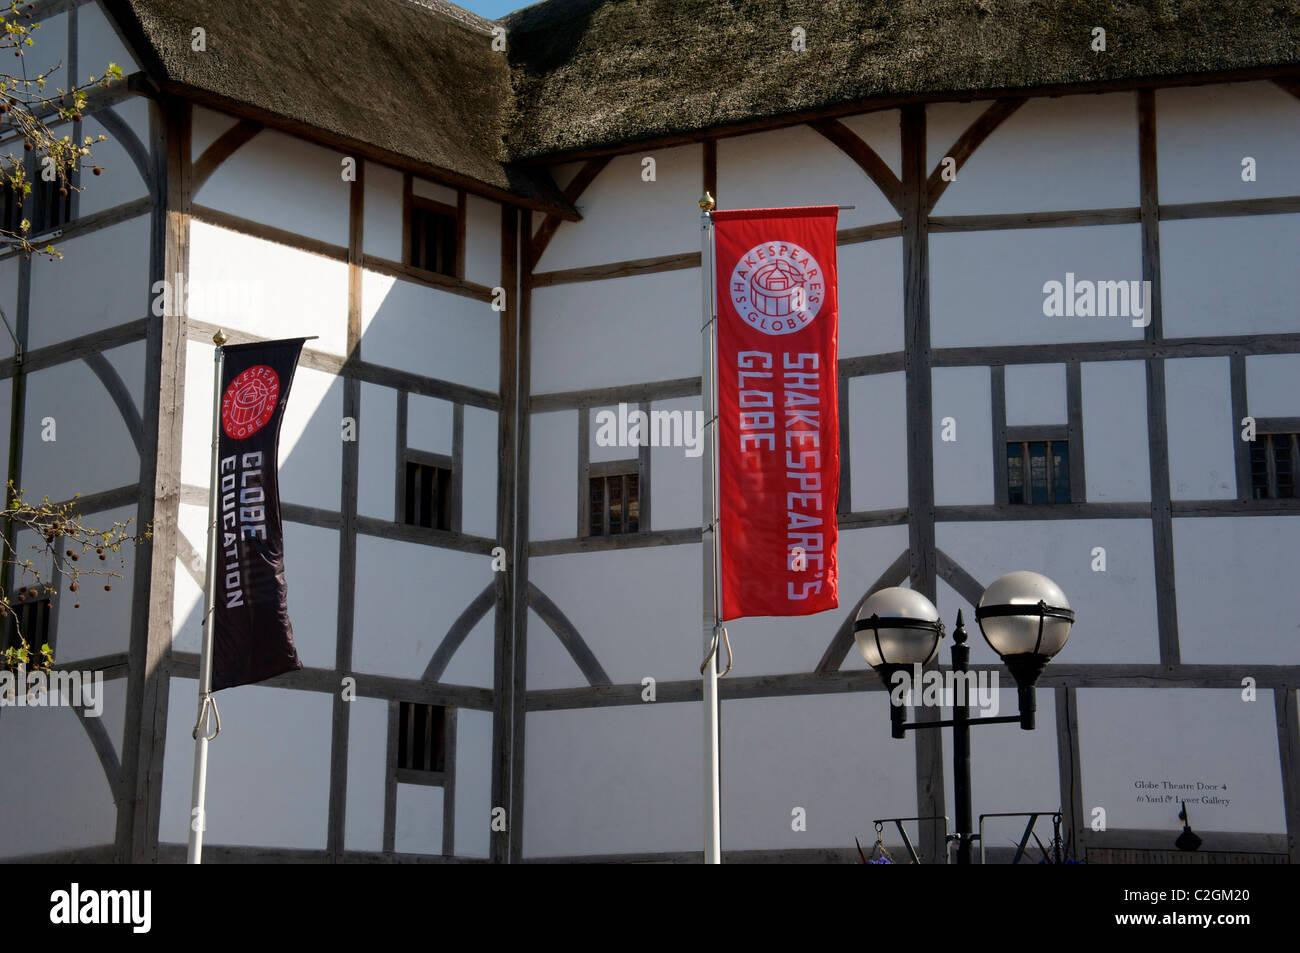 Shakespeare's Globe Theatre, Bankside, London, England UK - Stock Image